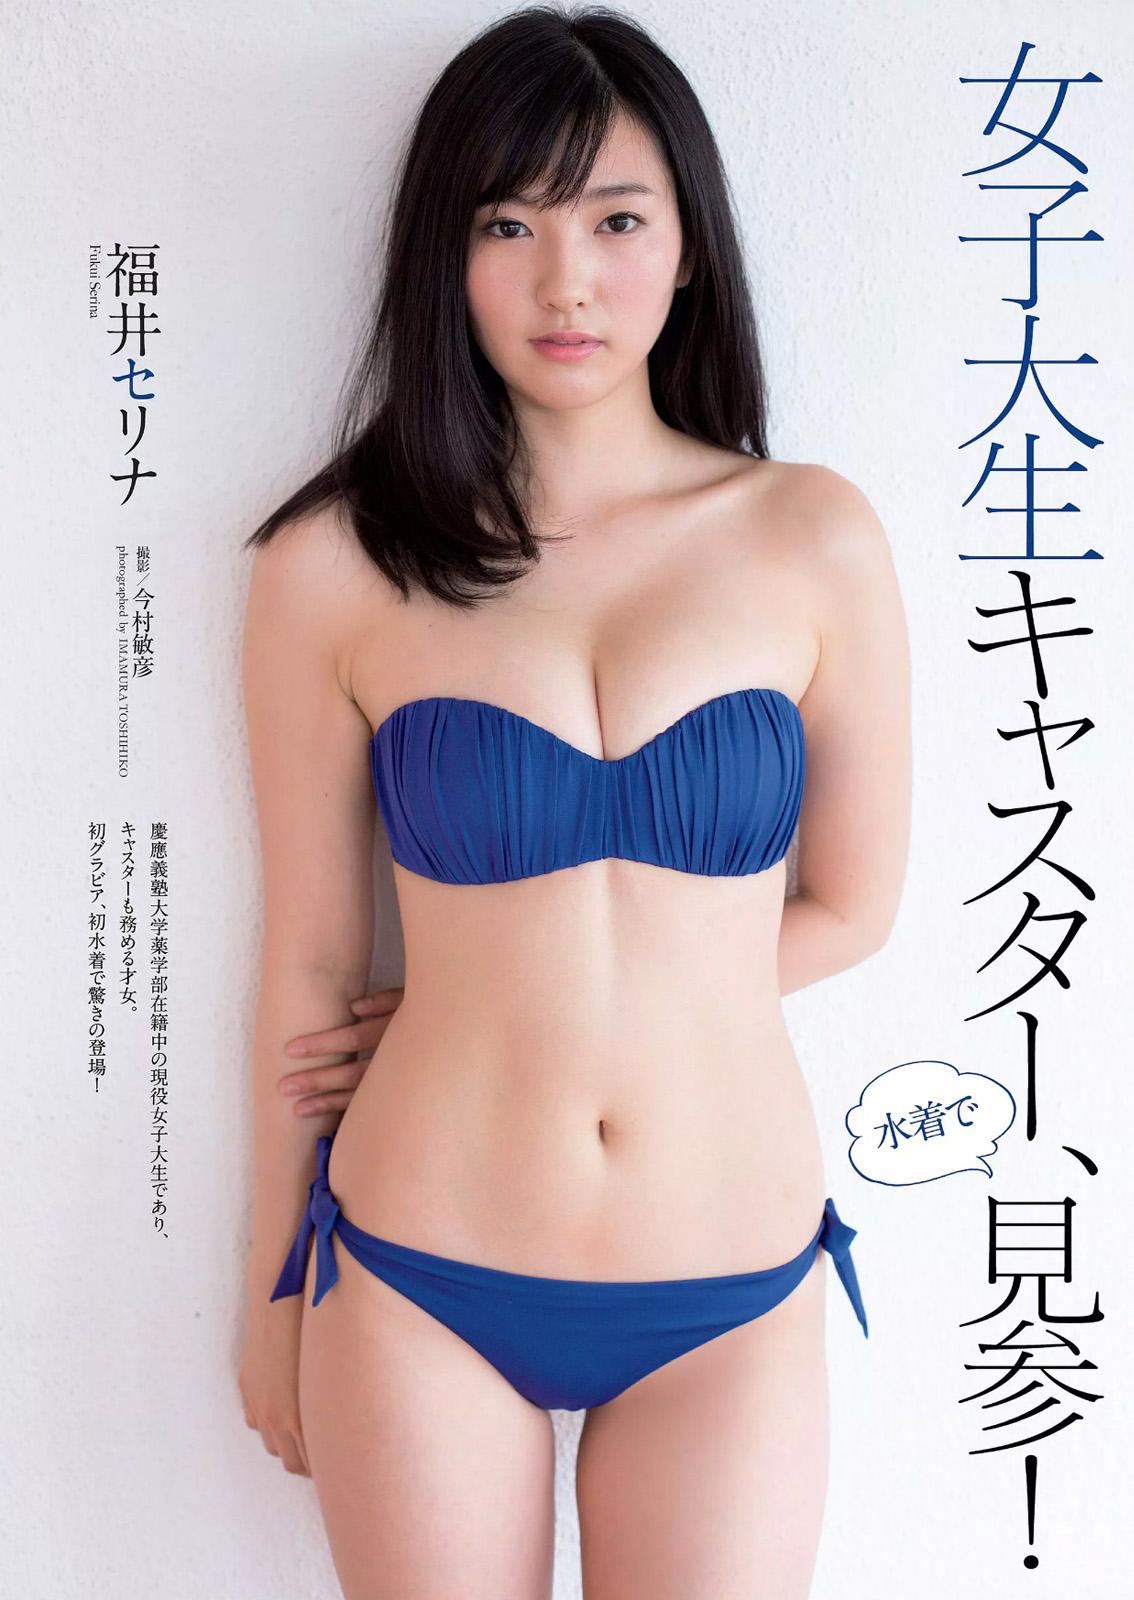 Serina Fukui 福井セリナ, Weekly Playboy 2017 No.42 (週刊プレイボーイ 2017年42号)